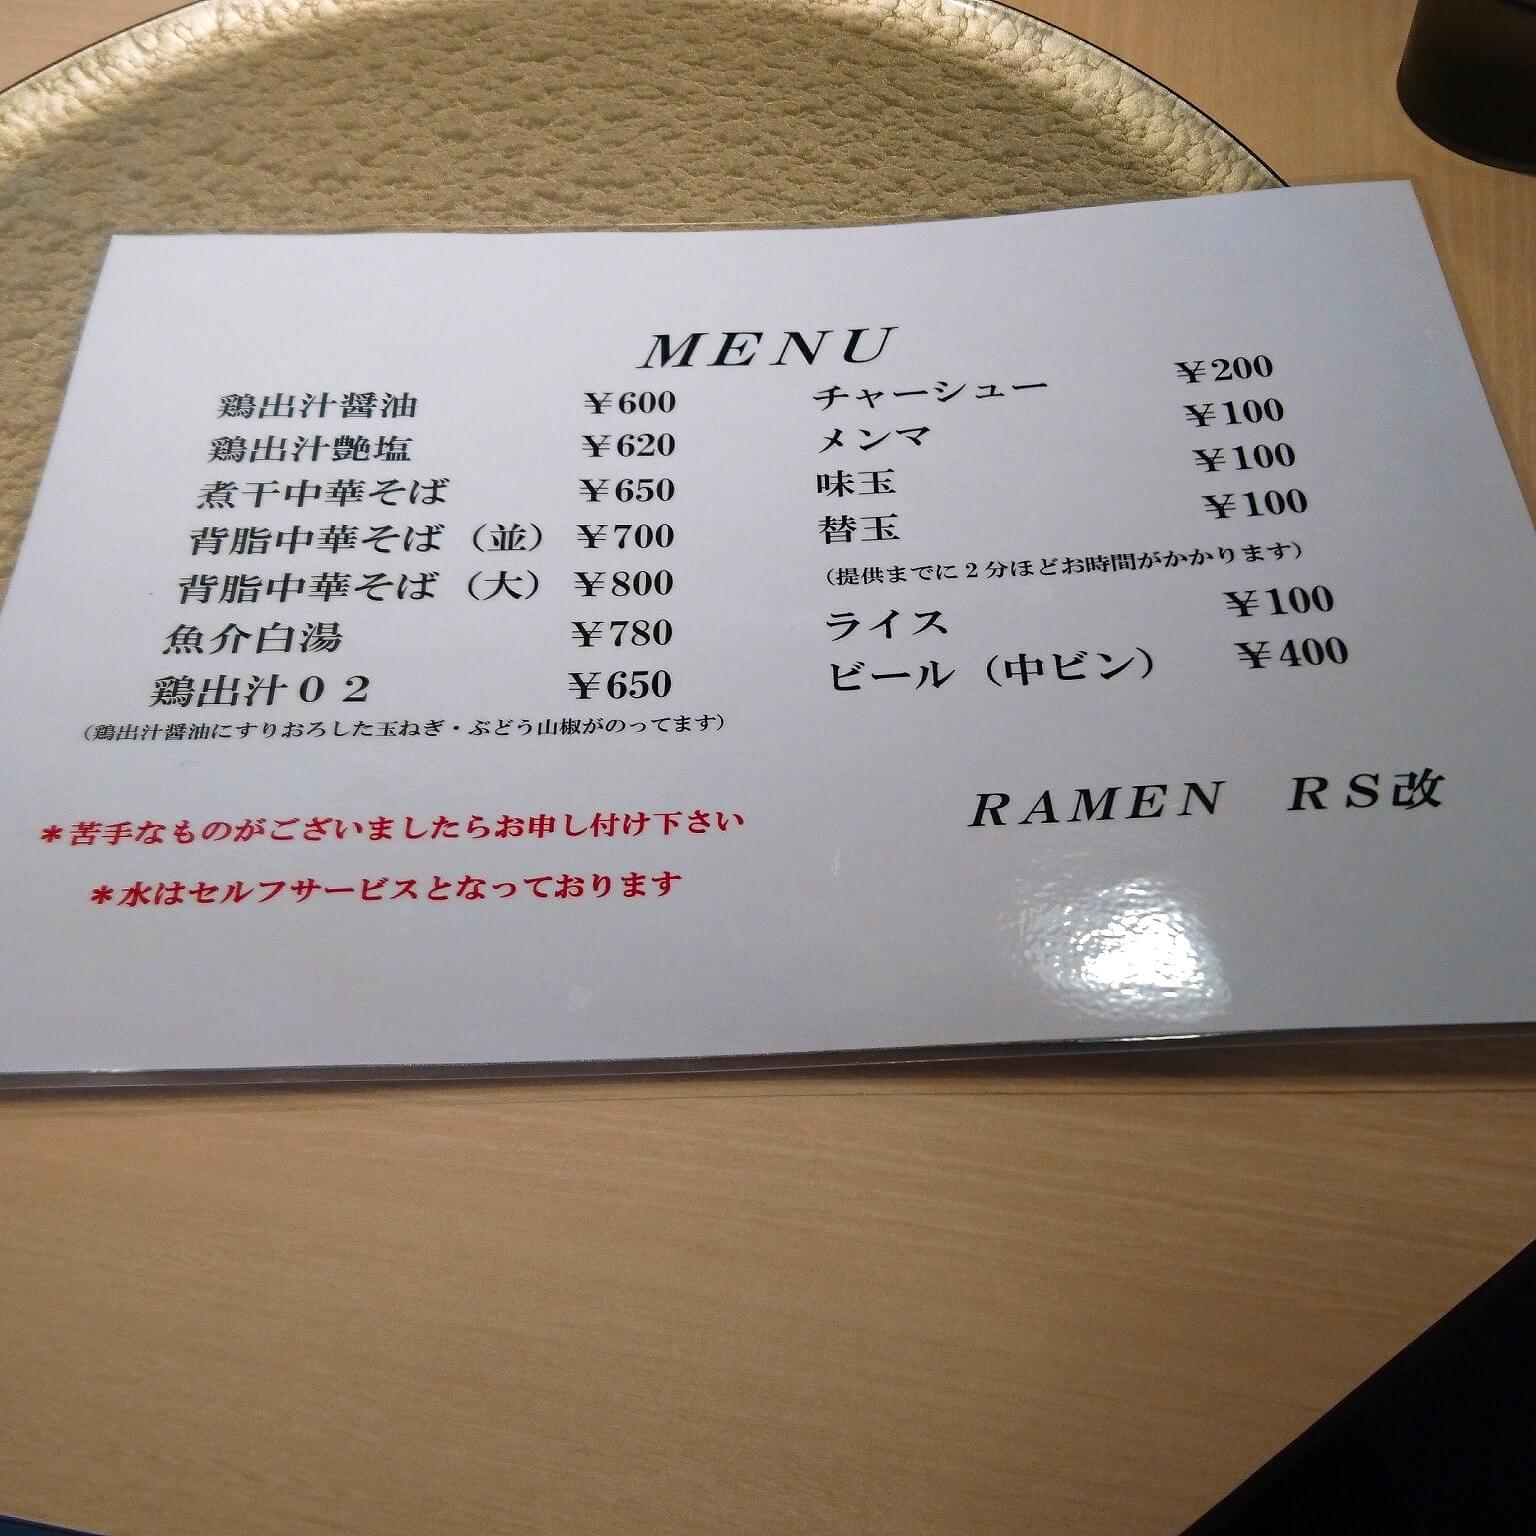 RAMEN RS 改 メニュー